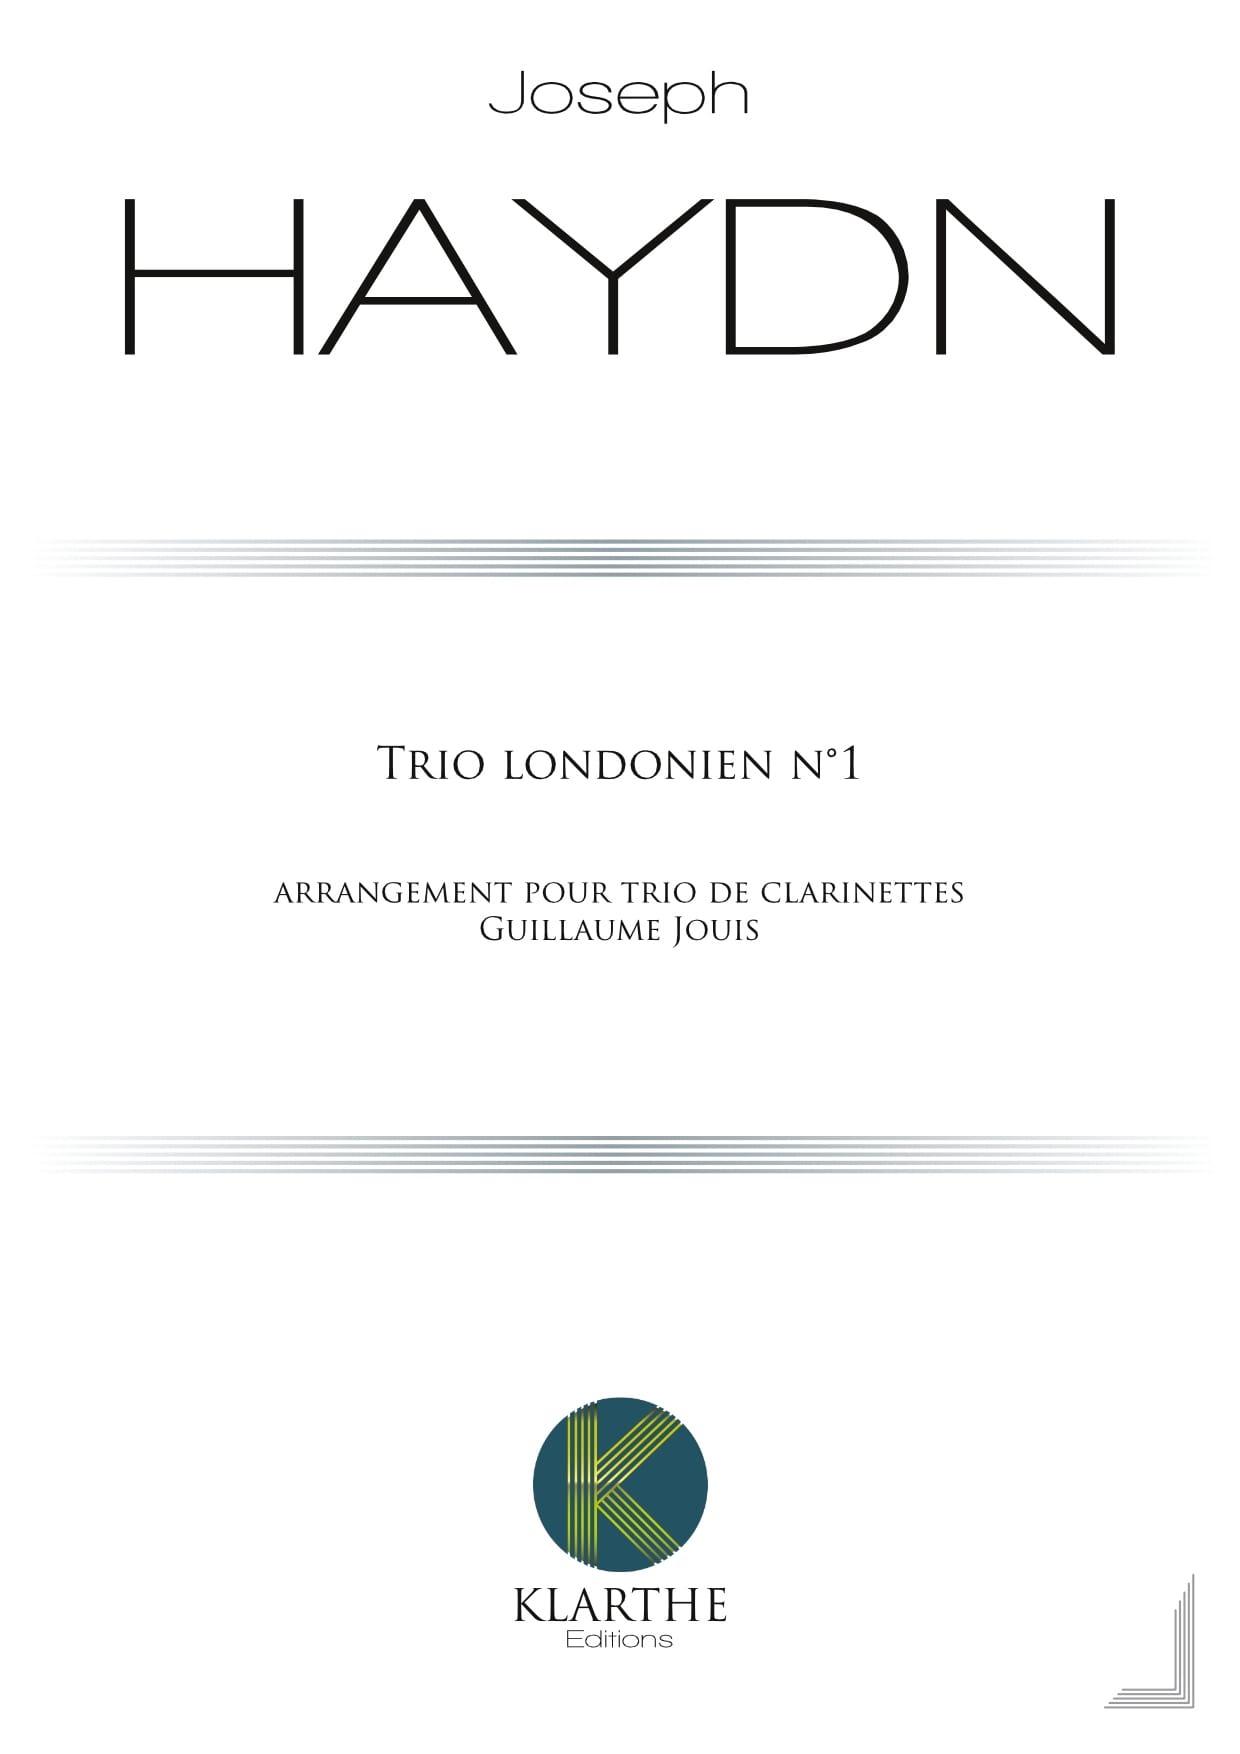 Trio n° 1 - 3 Clarinettes - HAYDN - Partition - laflutedepan.com